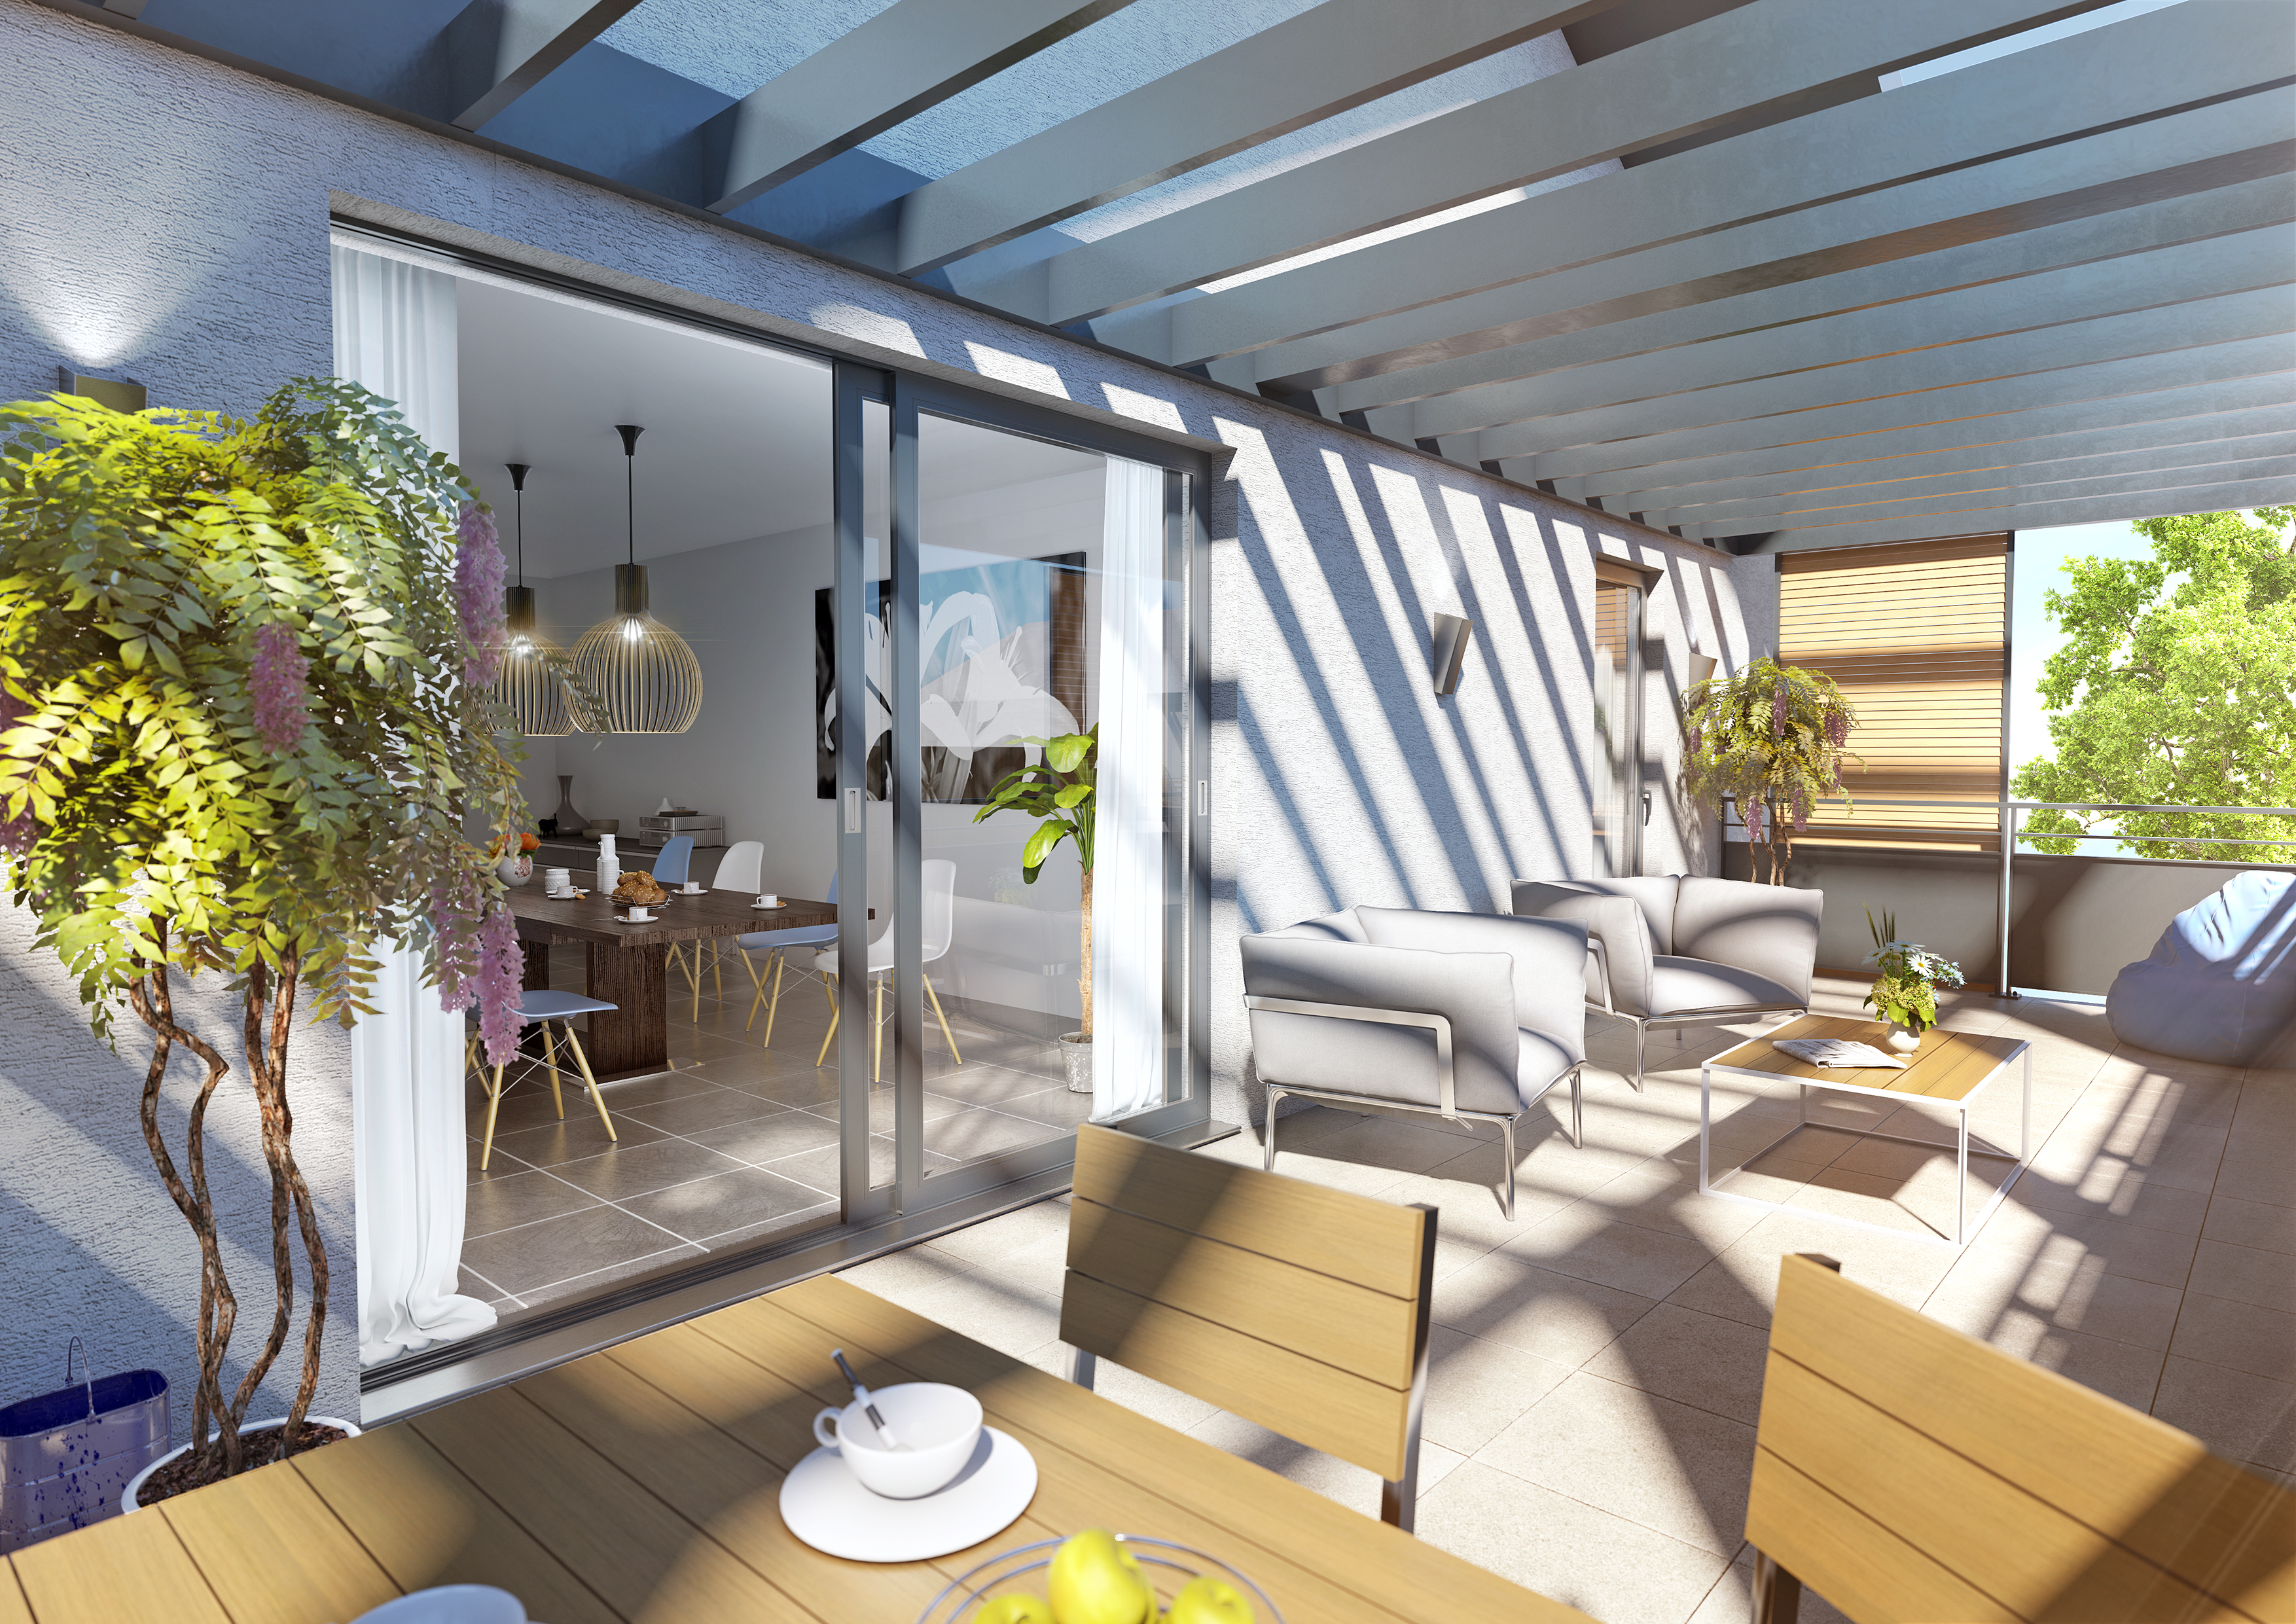 PixelDeLune_Exterieur - balcon HD V3a - A4 300dpi